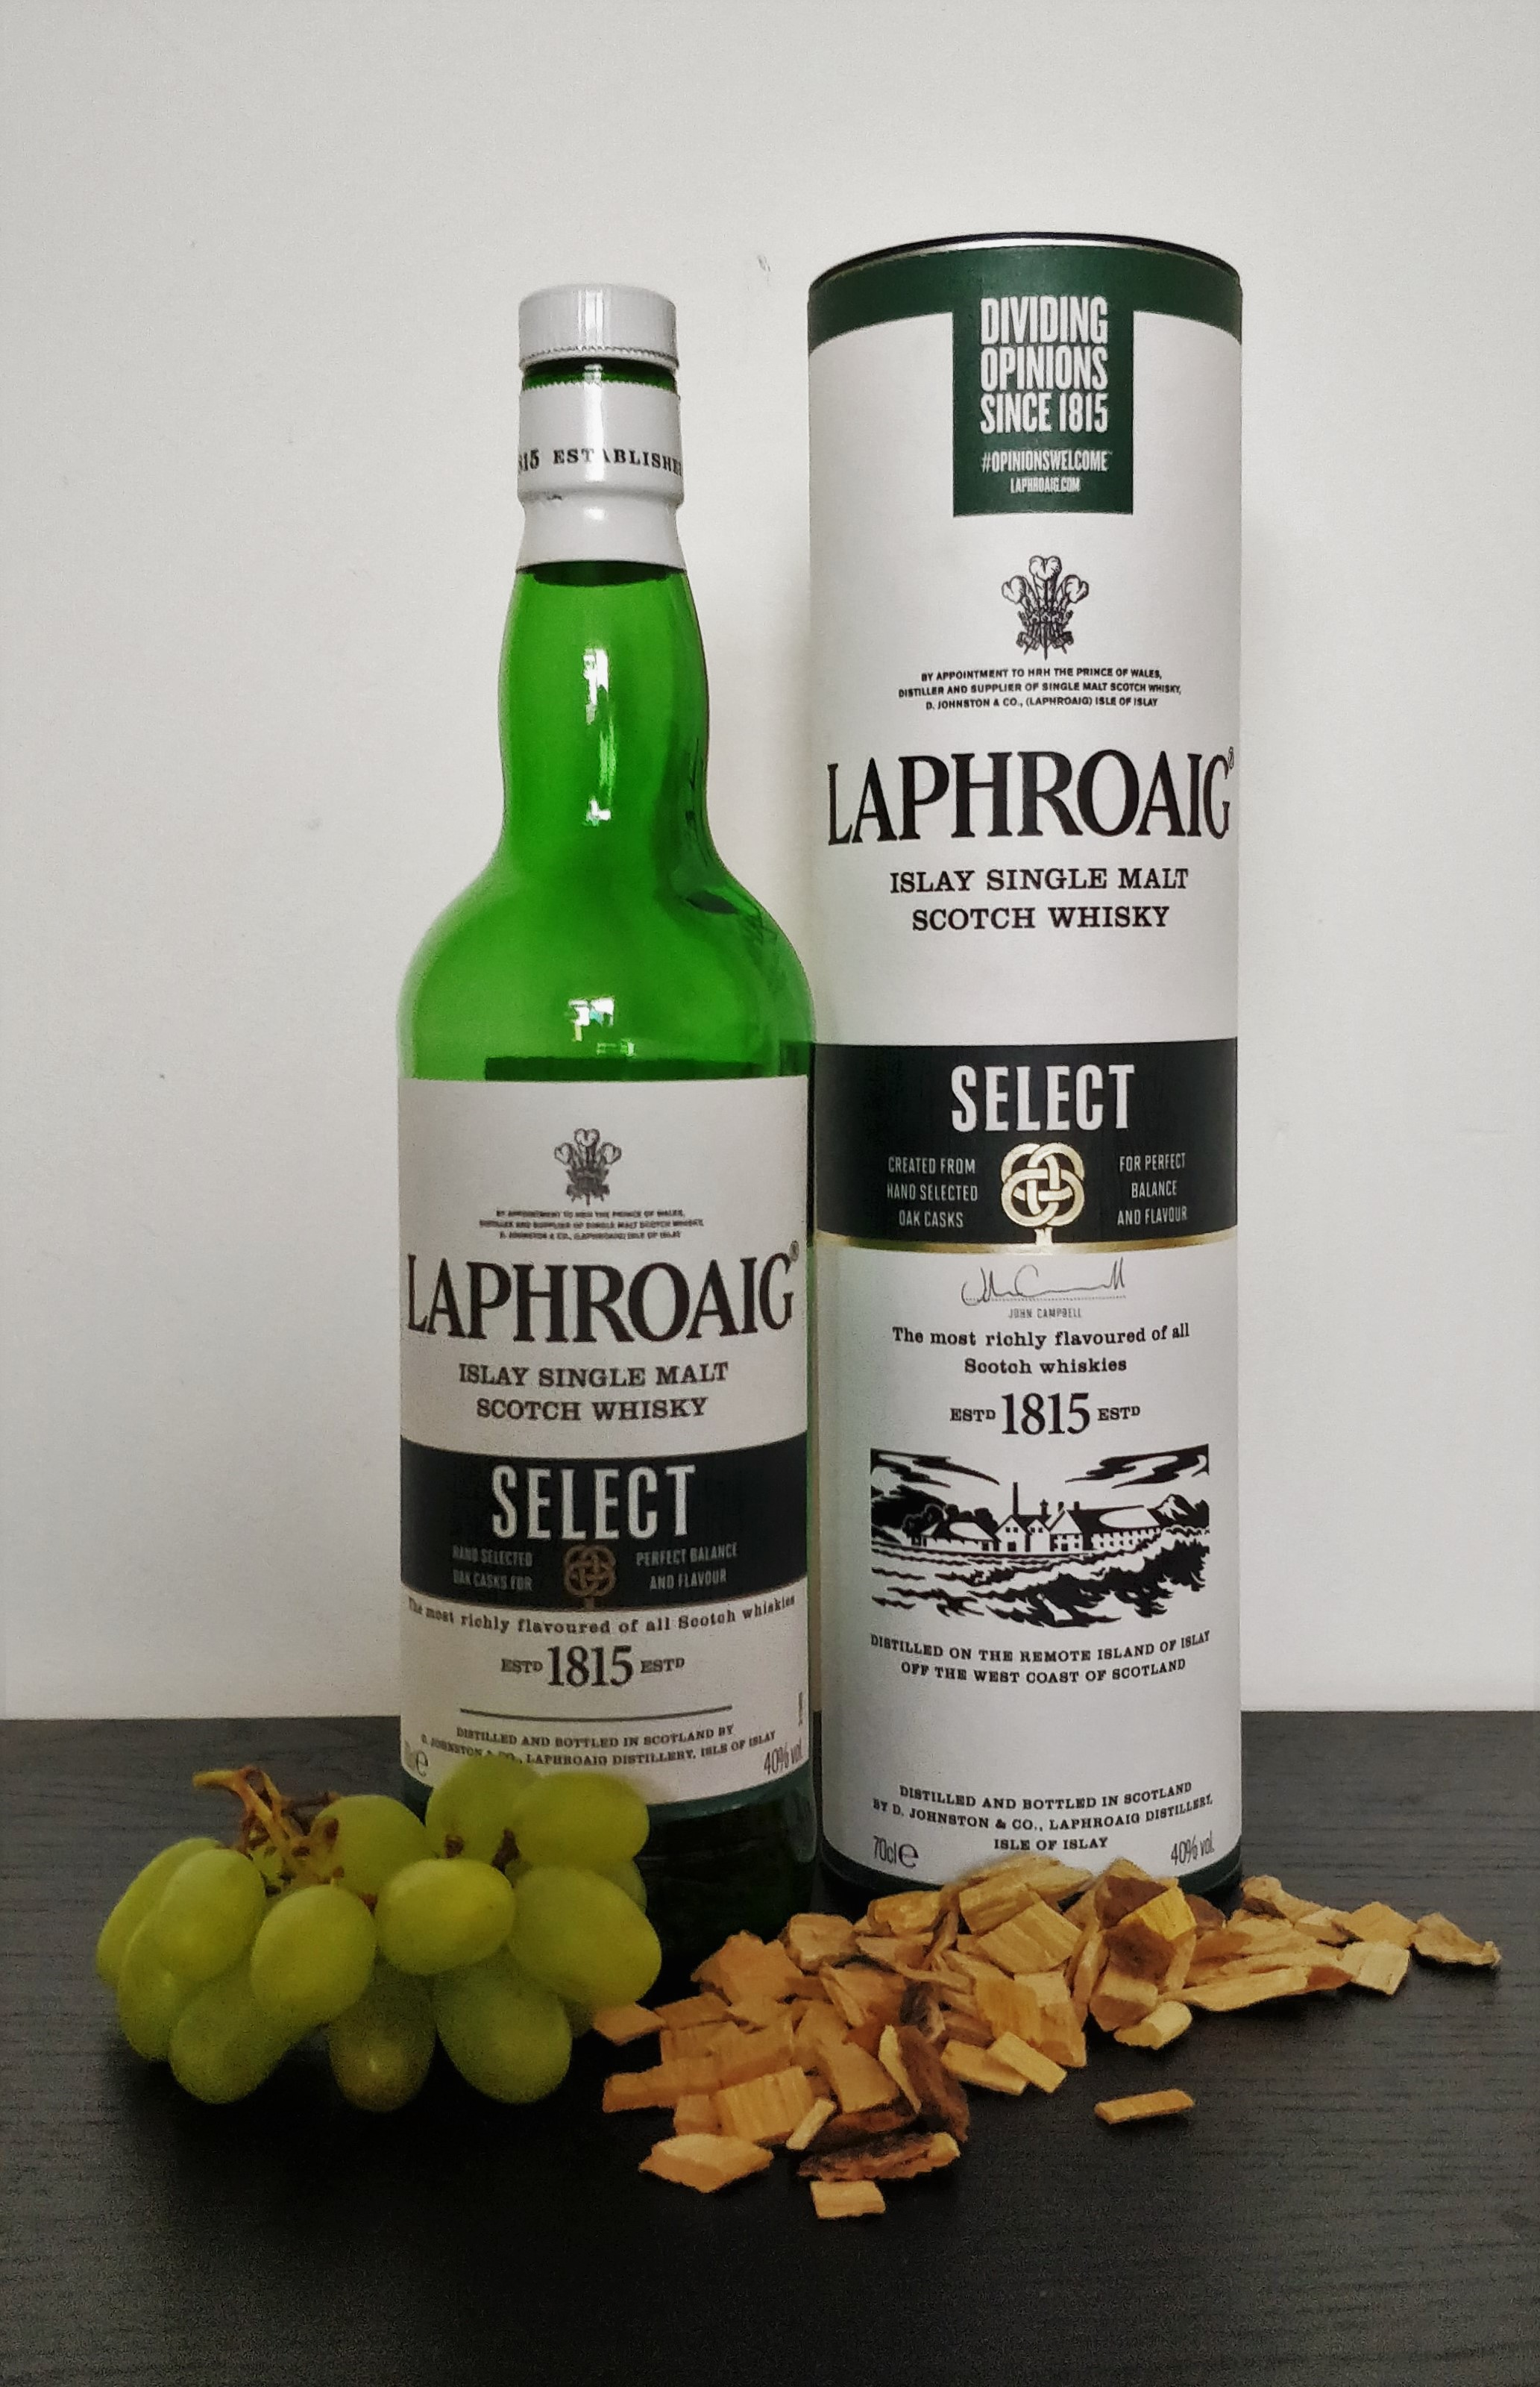 Laphroaig Select 01